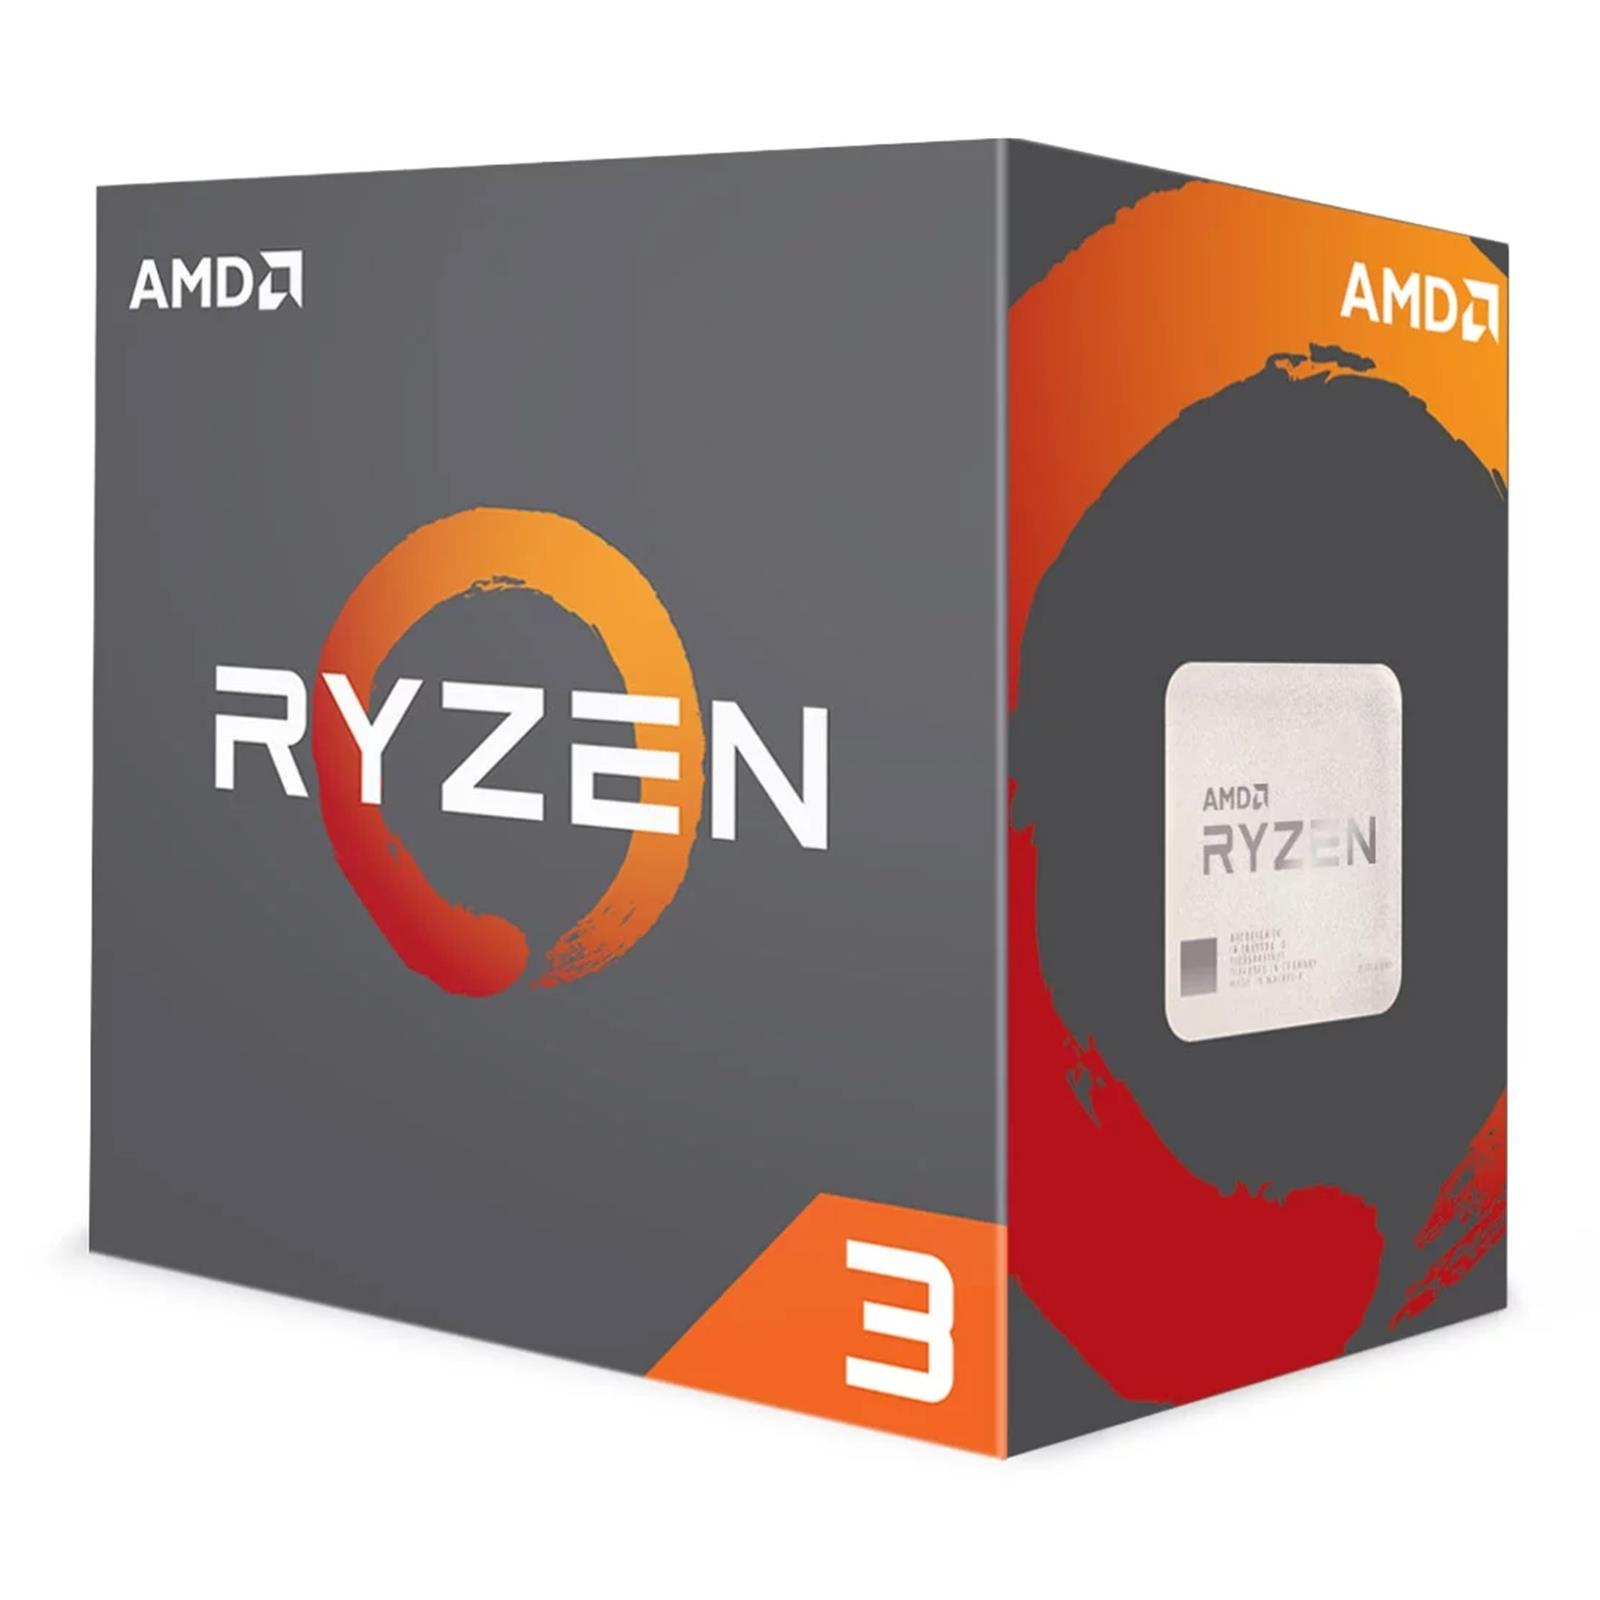 AMD Ryzen 3 1200 3.1GHz Quad Core AM4 Socket